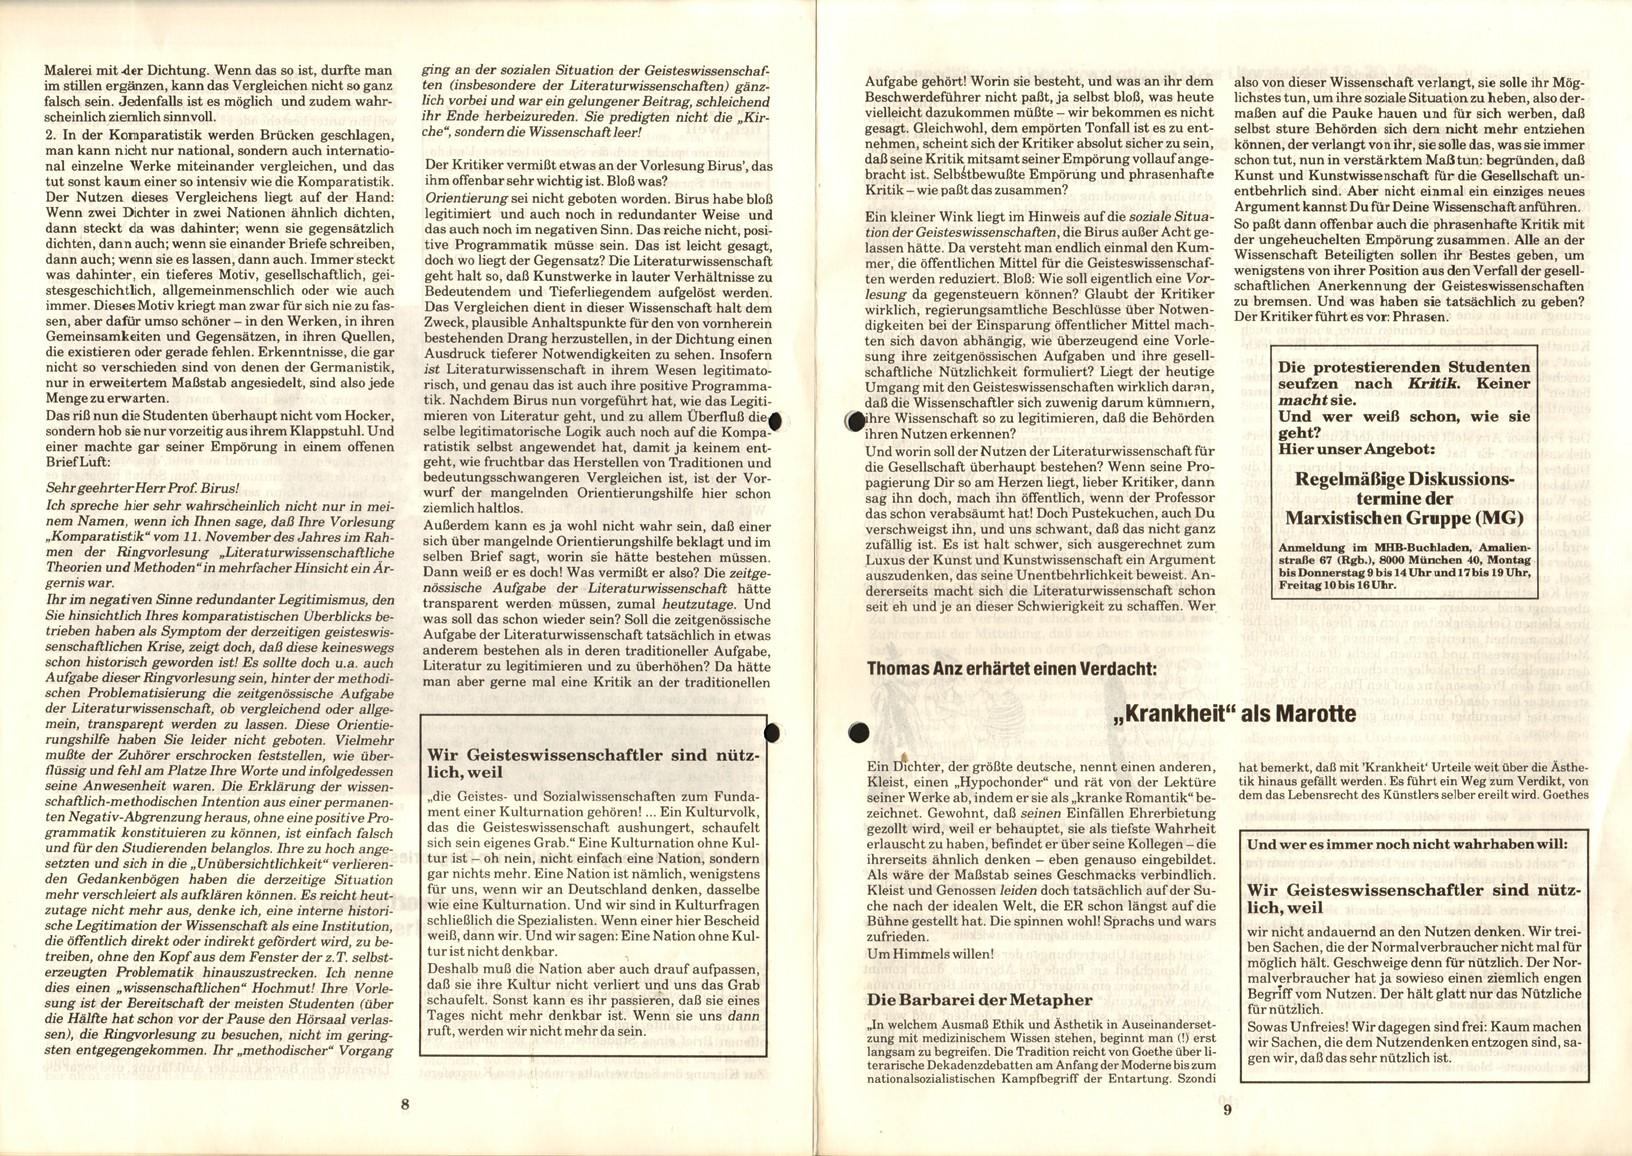 Muenchen_MG_FB_Germanistik_19881001_05